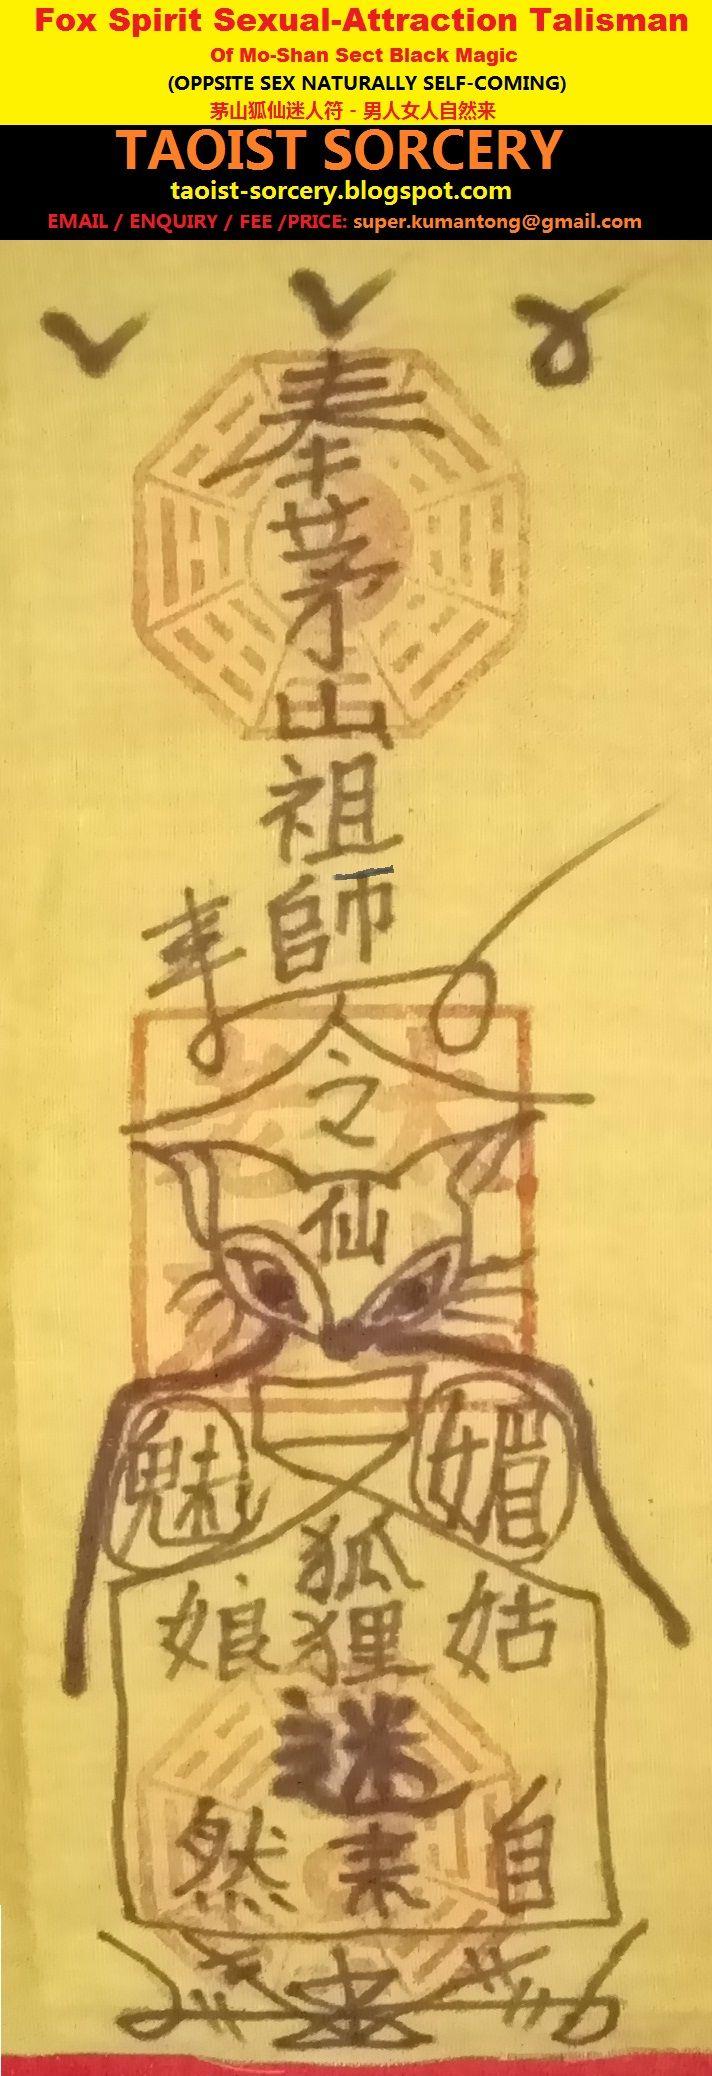 Fox Spirit Sexual-Attraction Talisman Of Mo-Shan Sect Black Magic ...